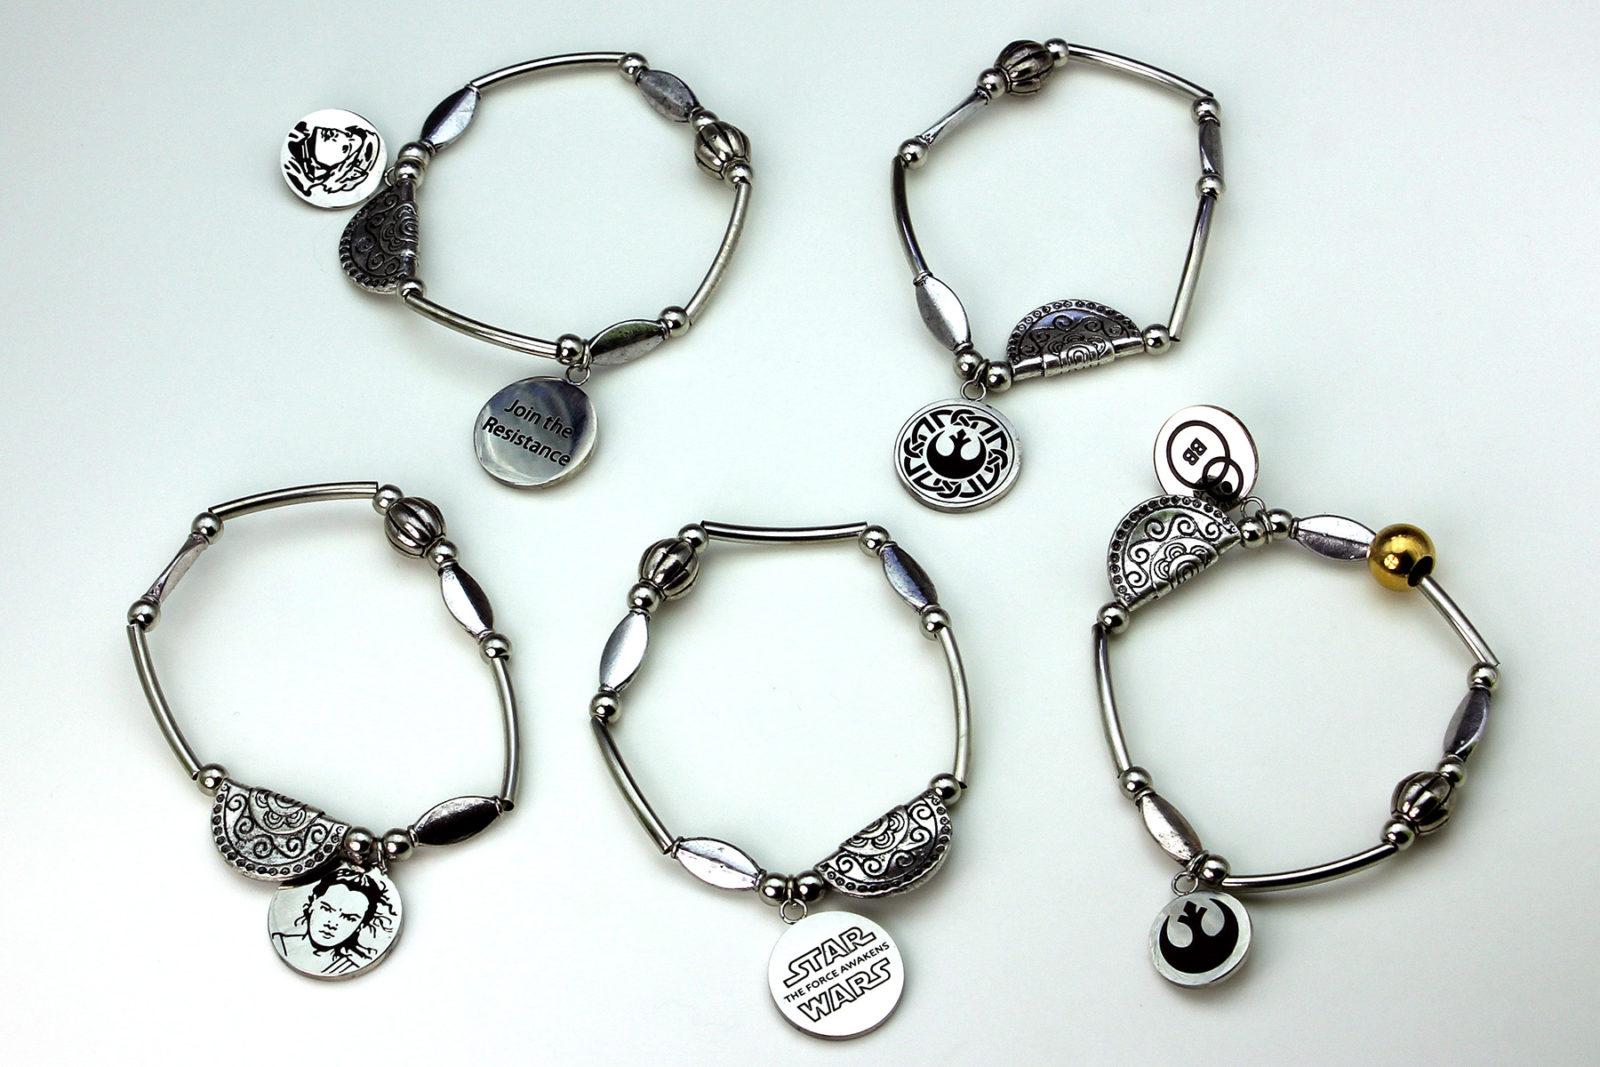 Review – Rey stretchable charm bracelet set